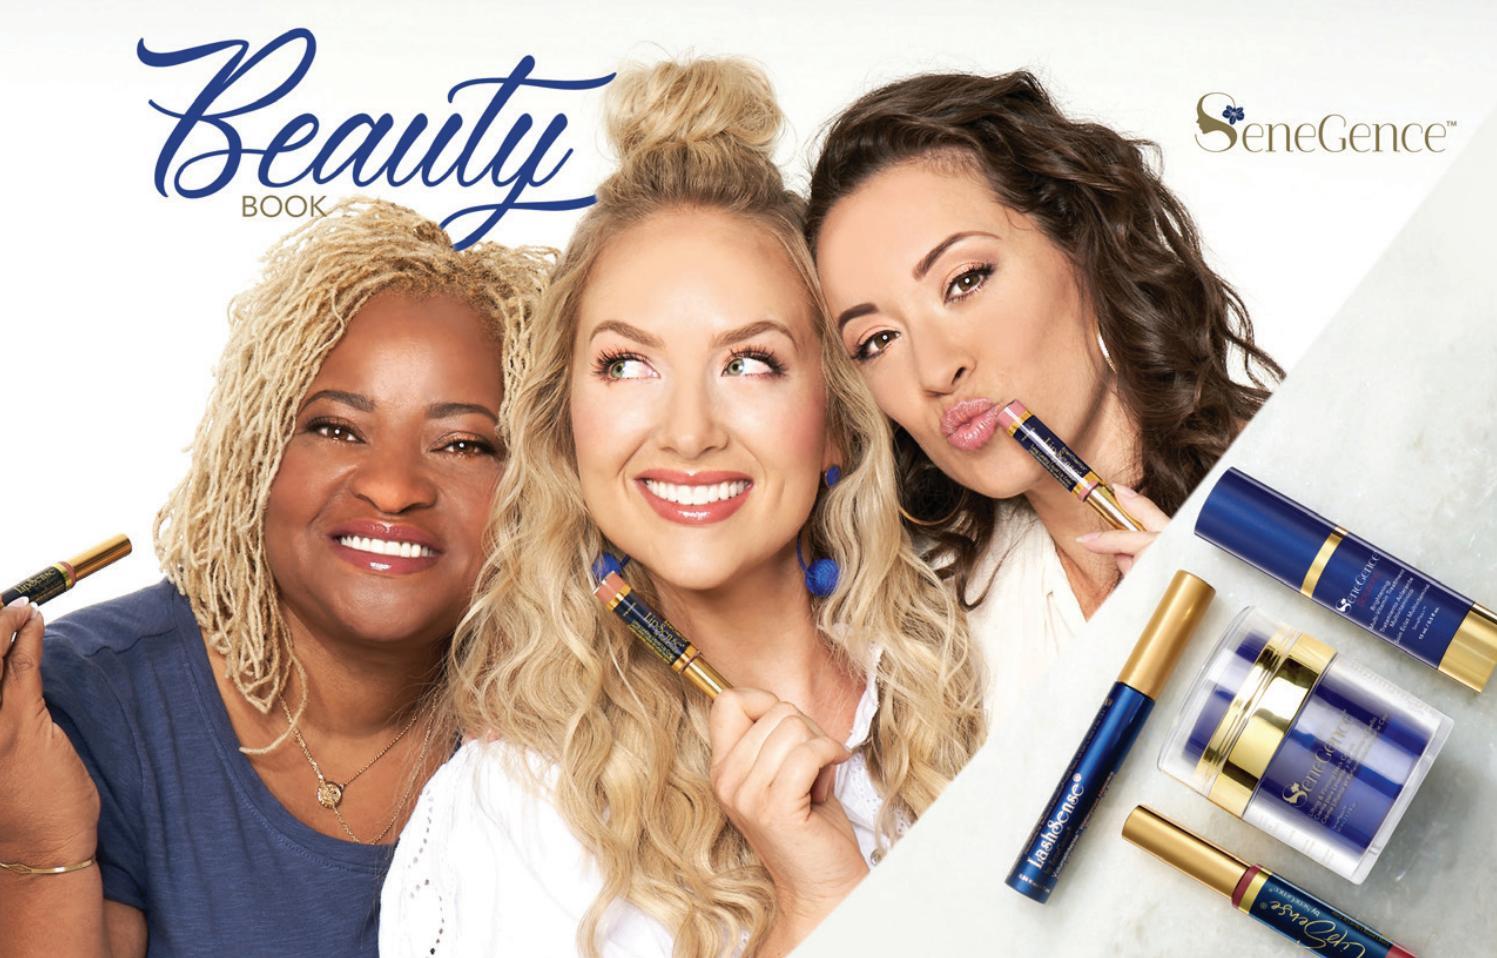 Senegence Beauty Book January 2020 By Kissesbyjamie Issuu